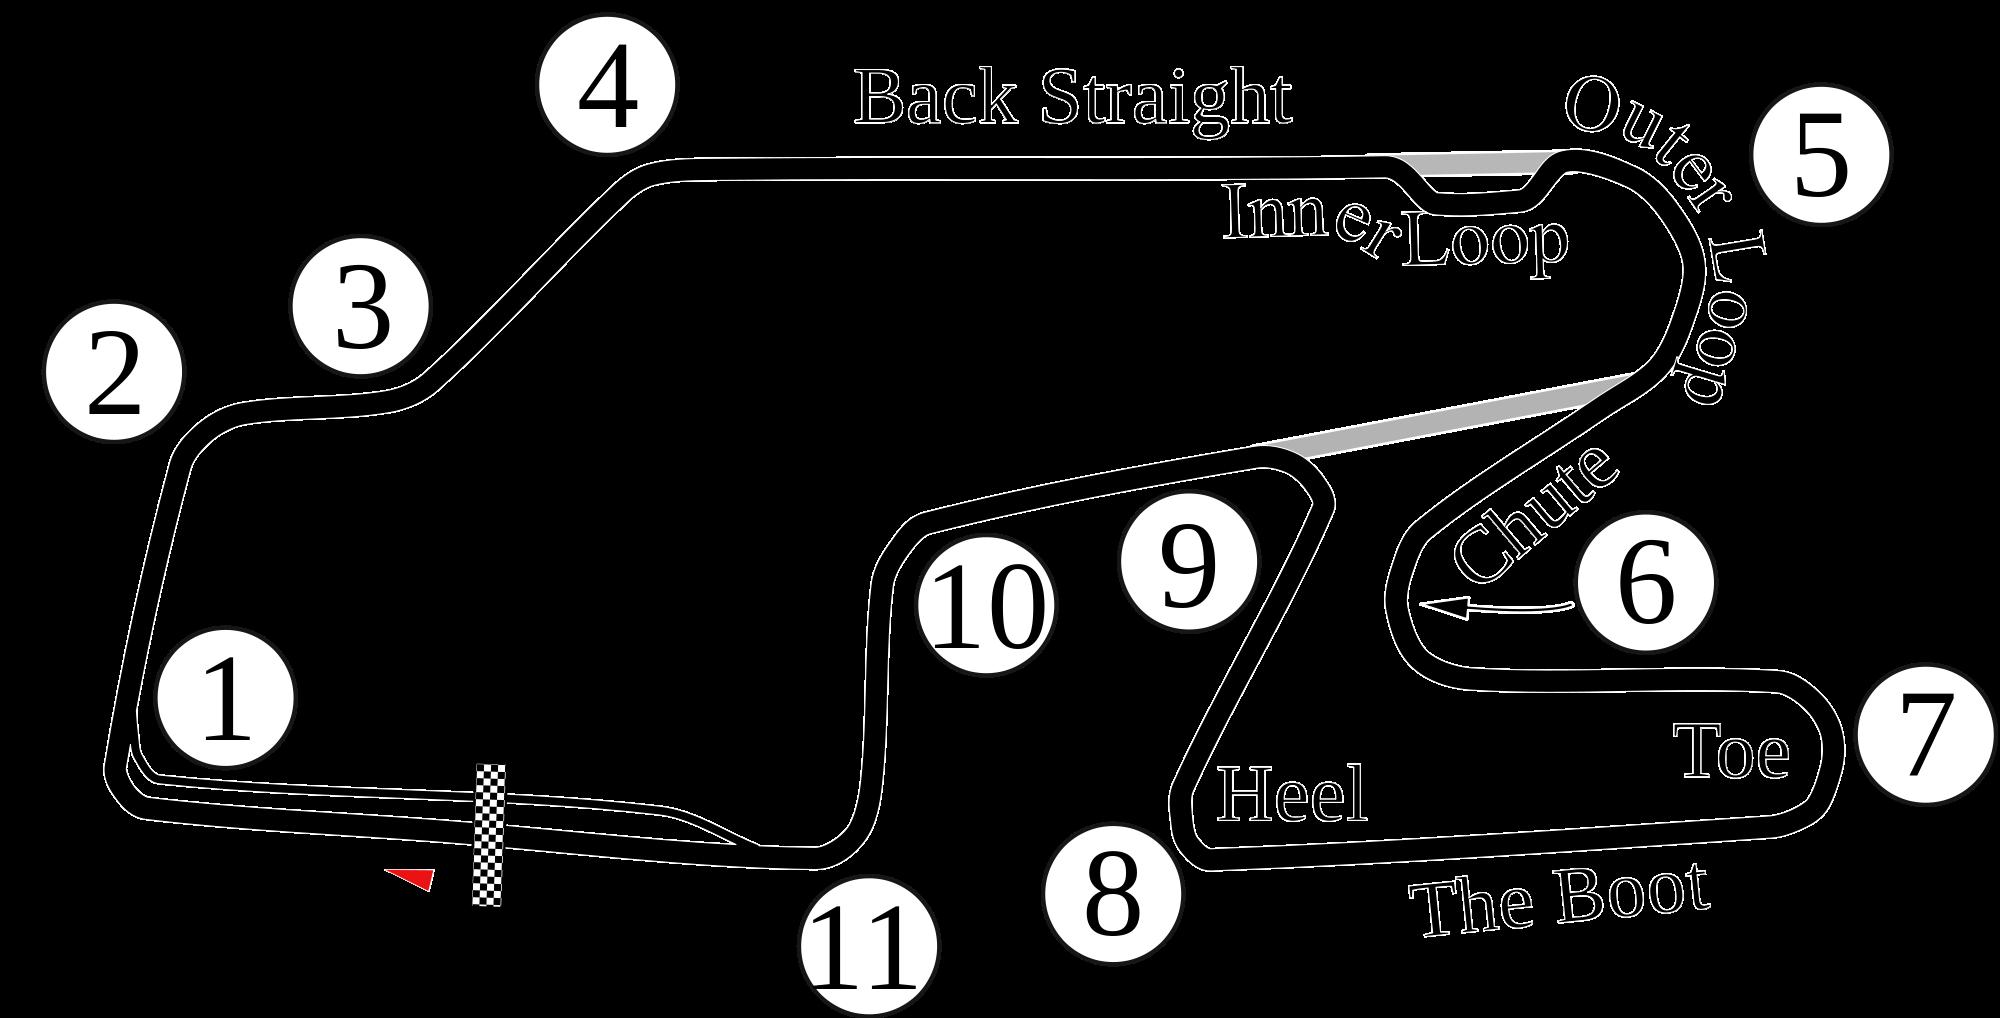 Watkins Glen International Raceway